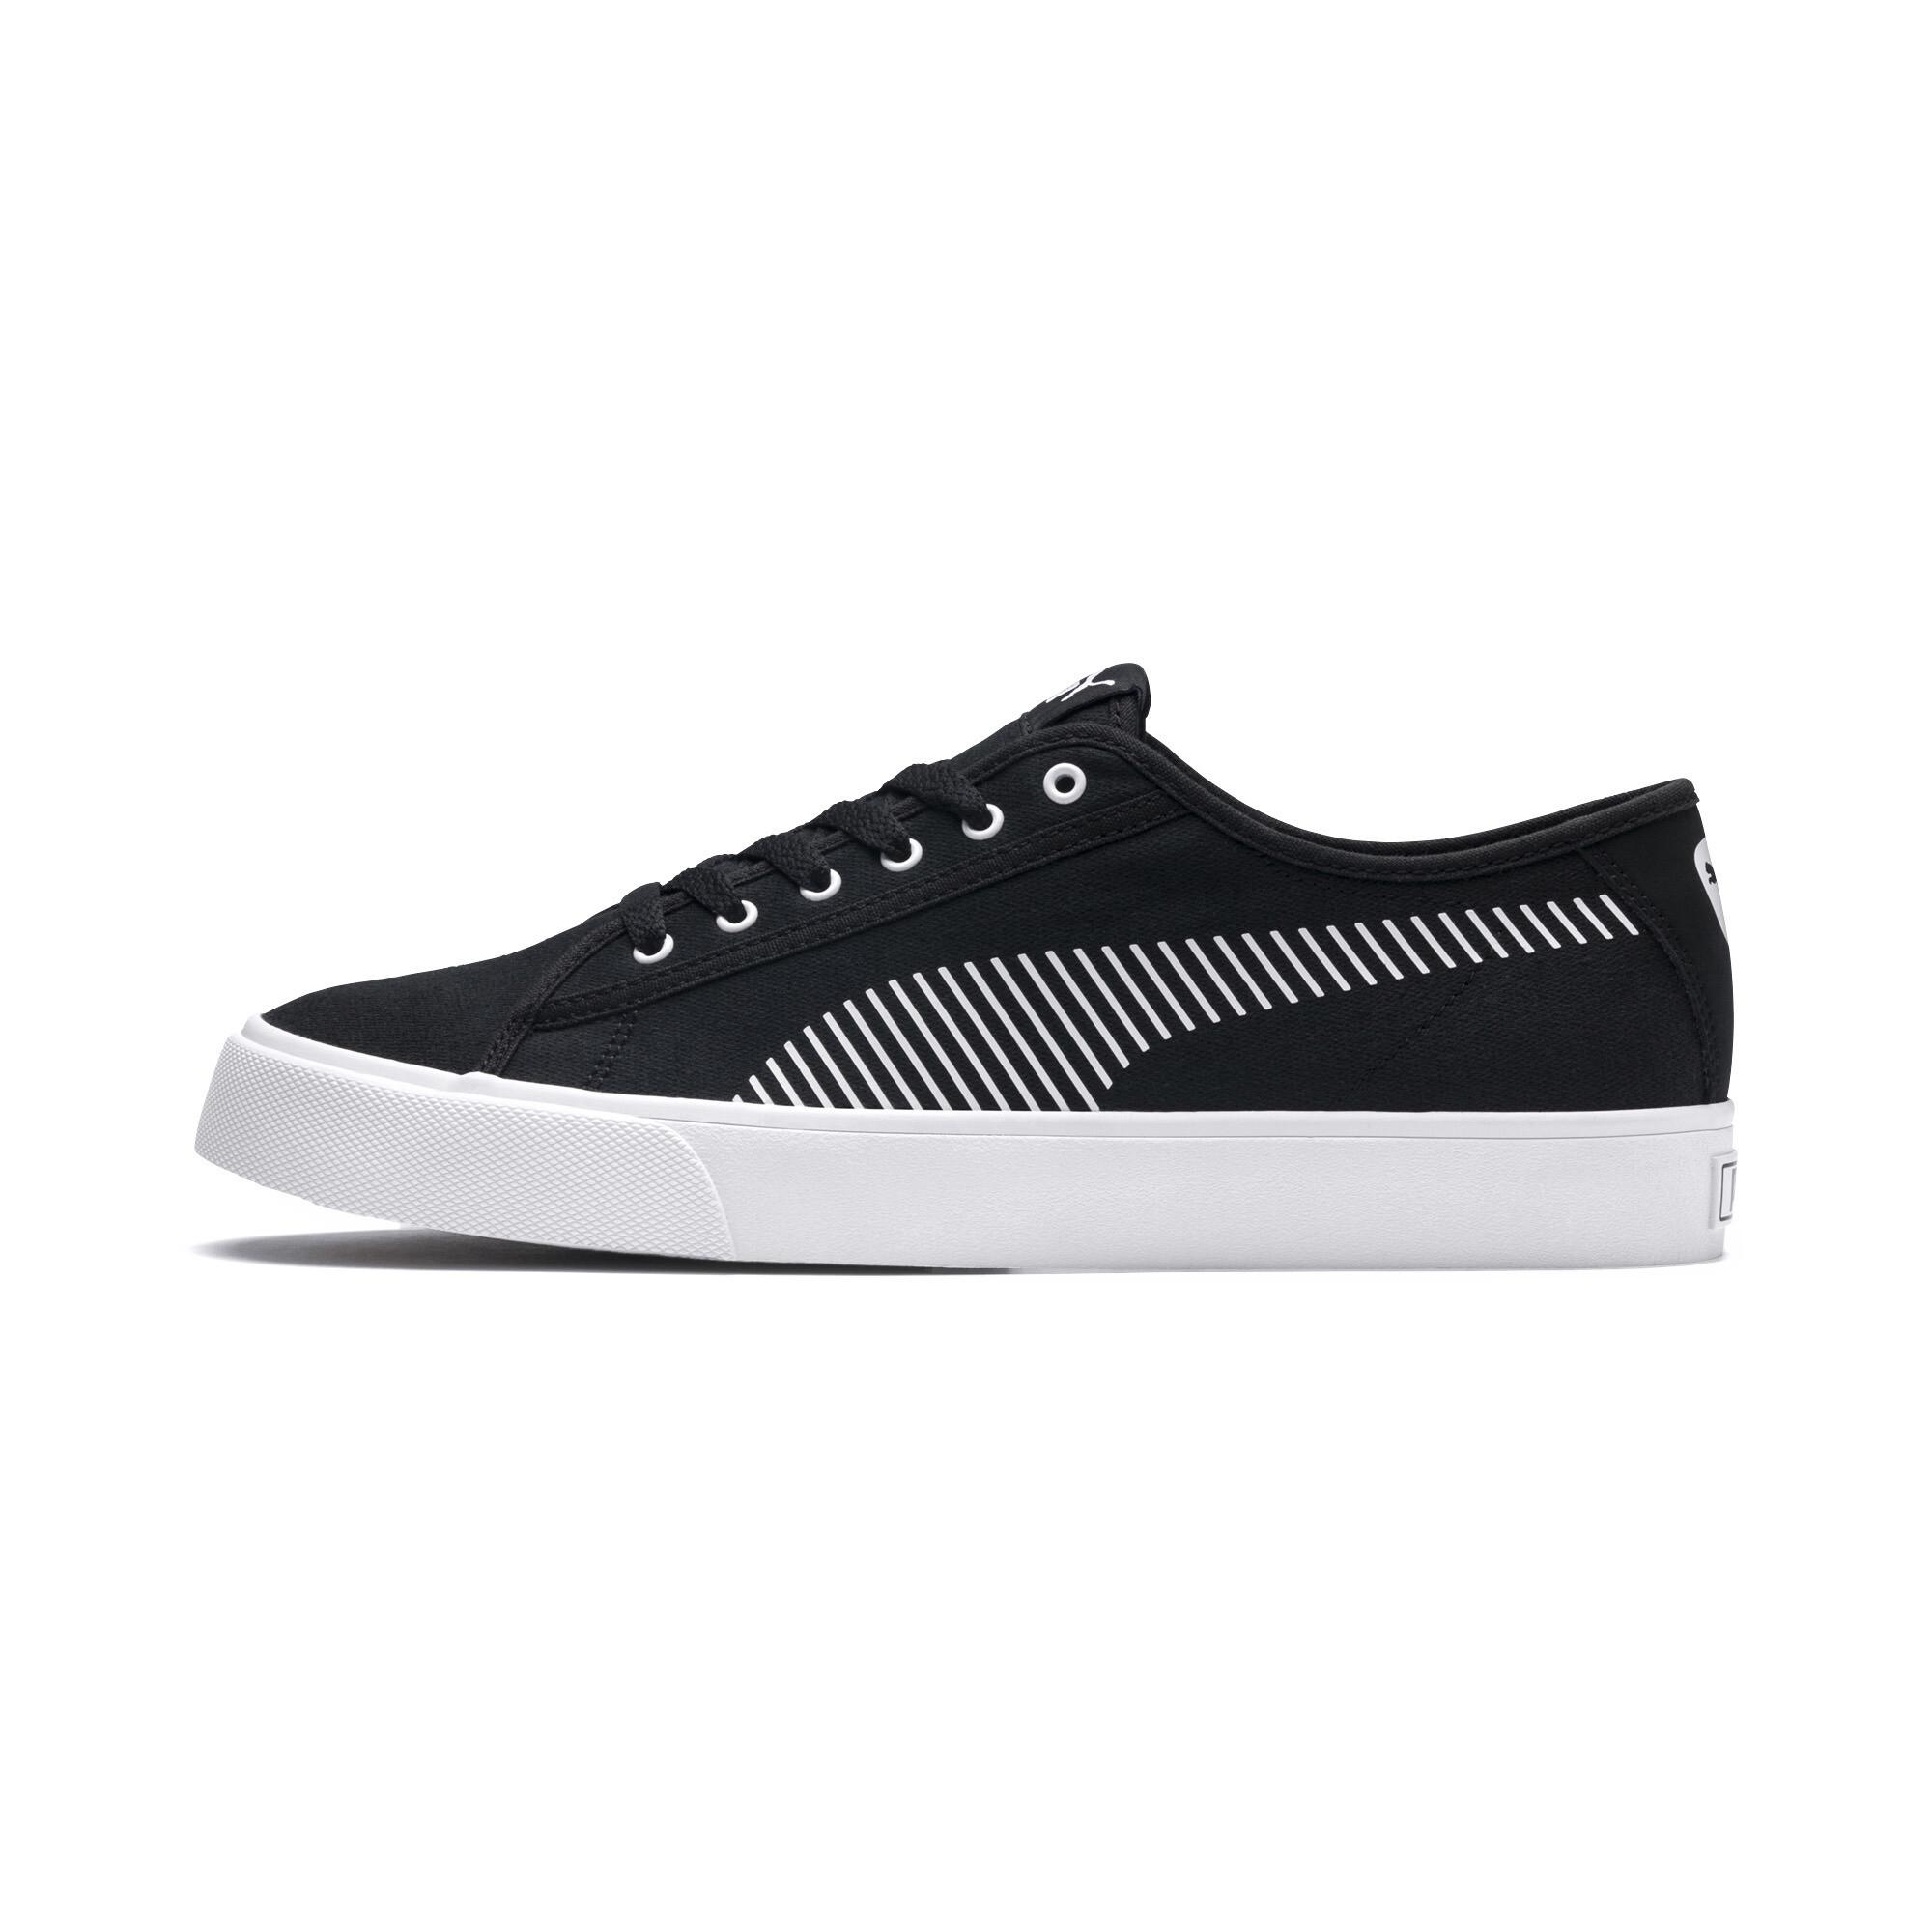 PUMA-Bari-Sneakers-Men-Shoe-Basics thumbnail 4